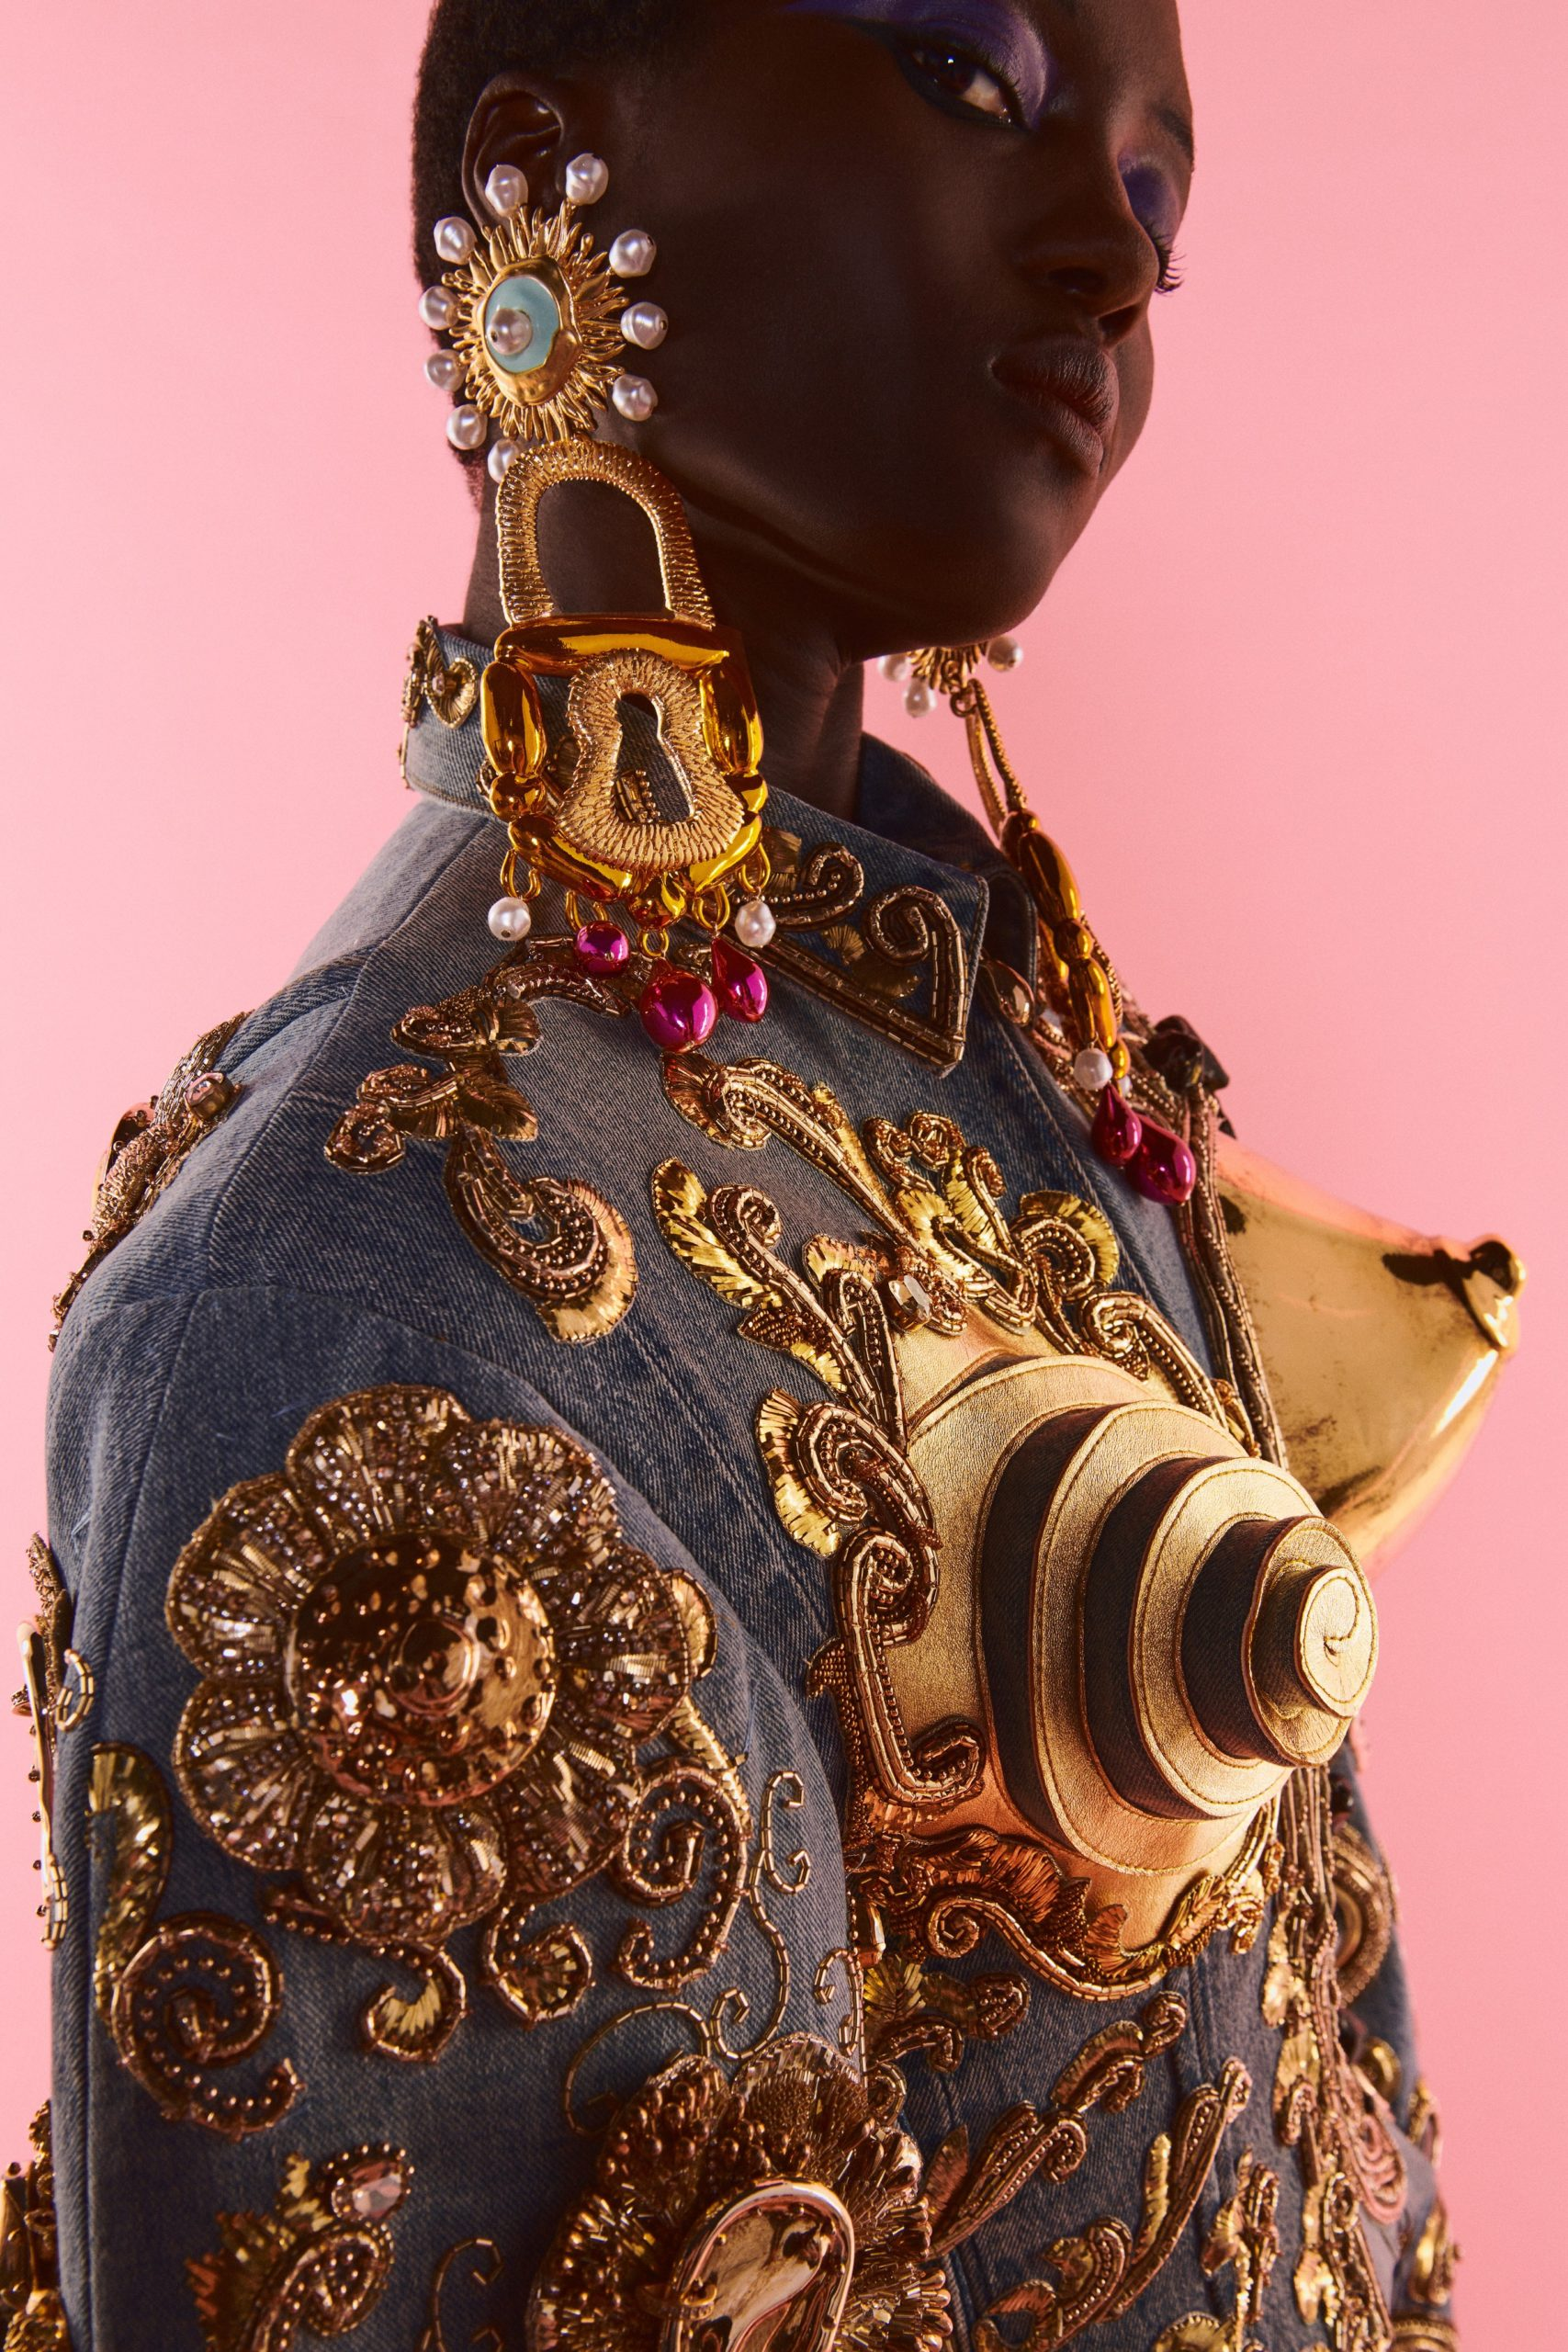 00007-Schiaparelli-Details-Couture-Fall-21-credit-Daniel-Roseberry-brand